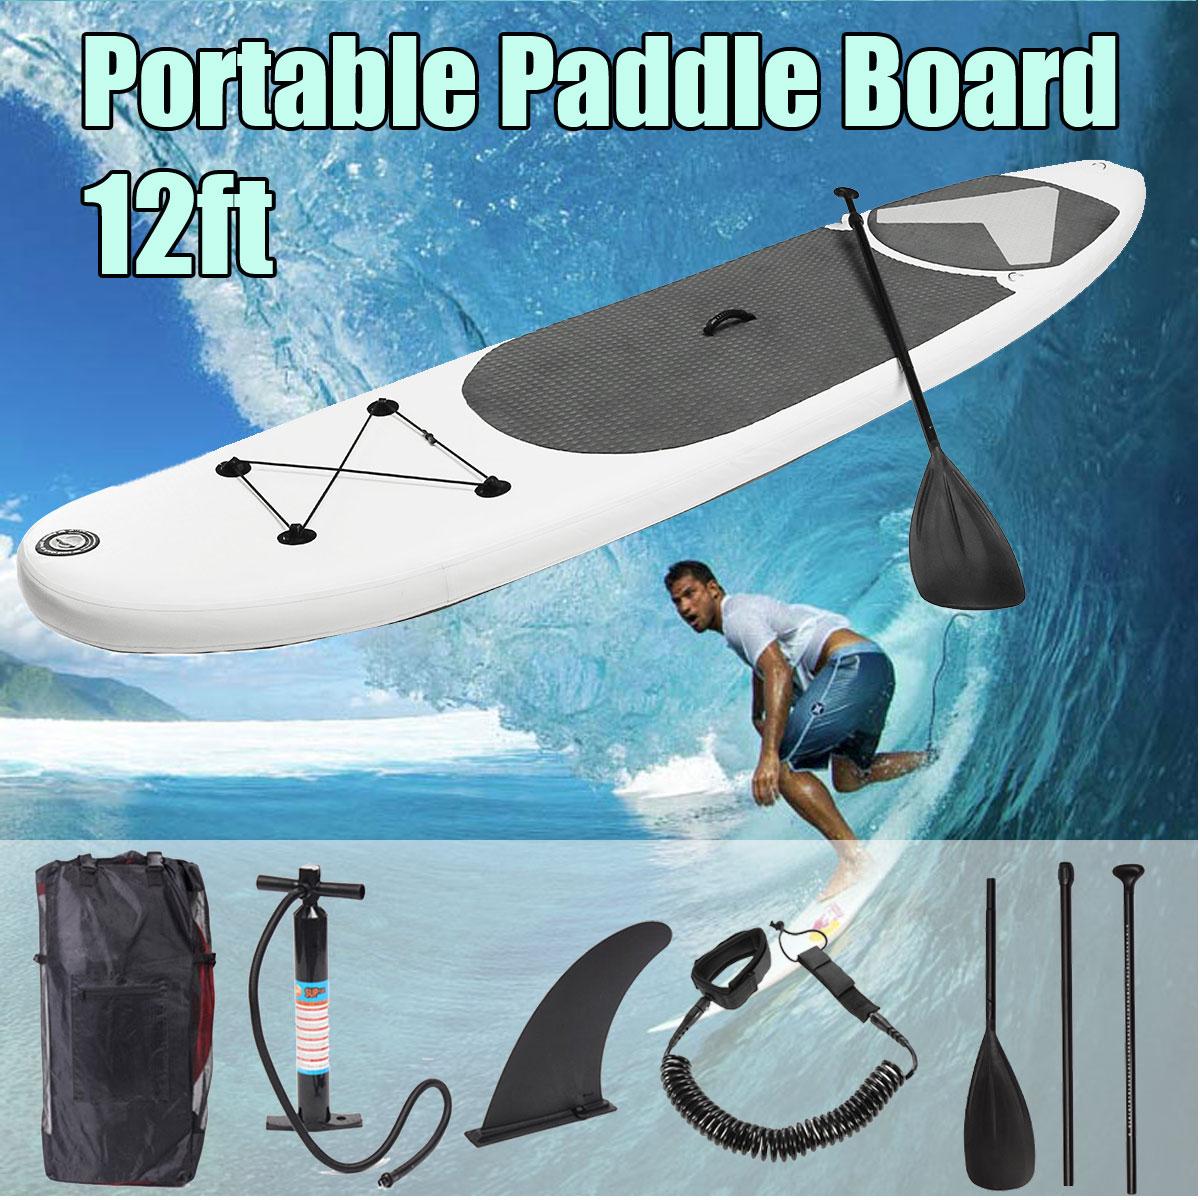 SGODDE 365*83*15 cm 12ft Portable Gonflable Surf Aileron Planche de Surf Stand Up Paddle Board